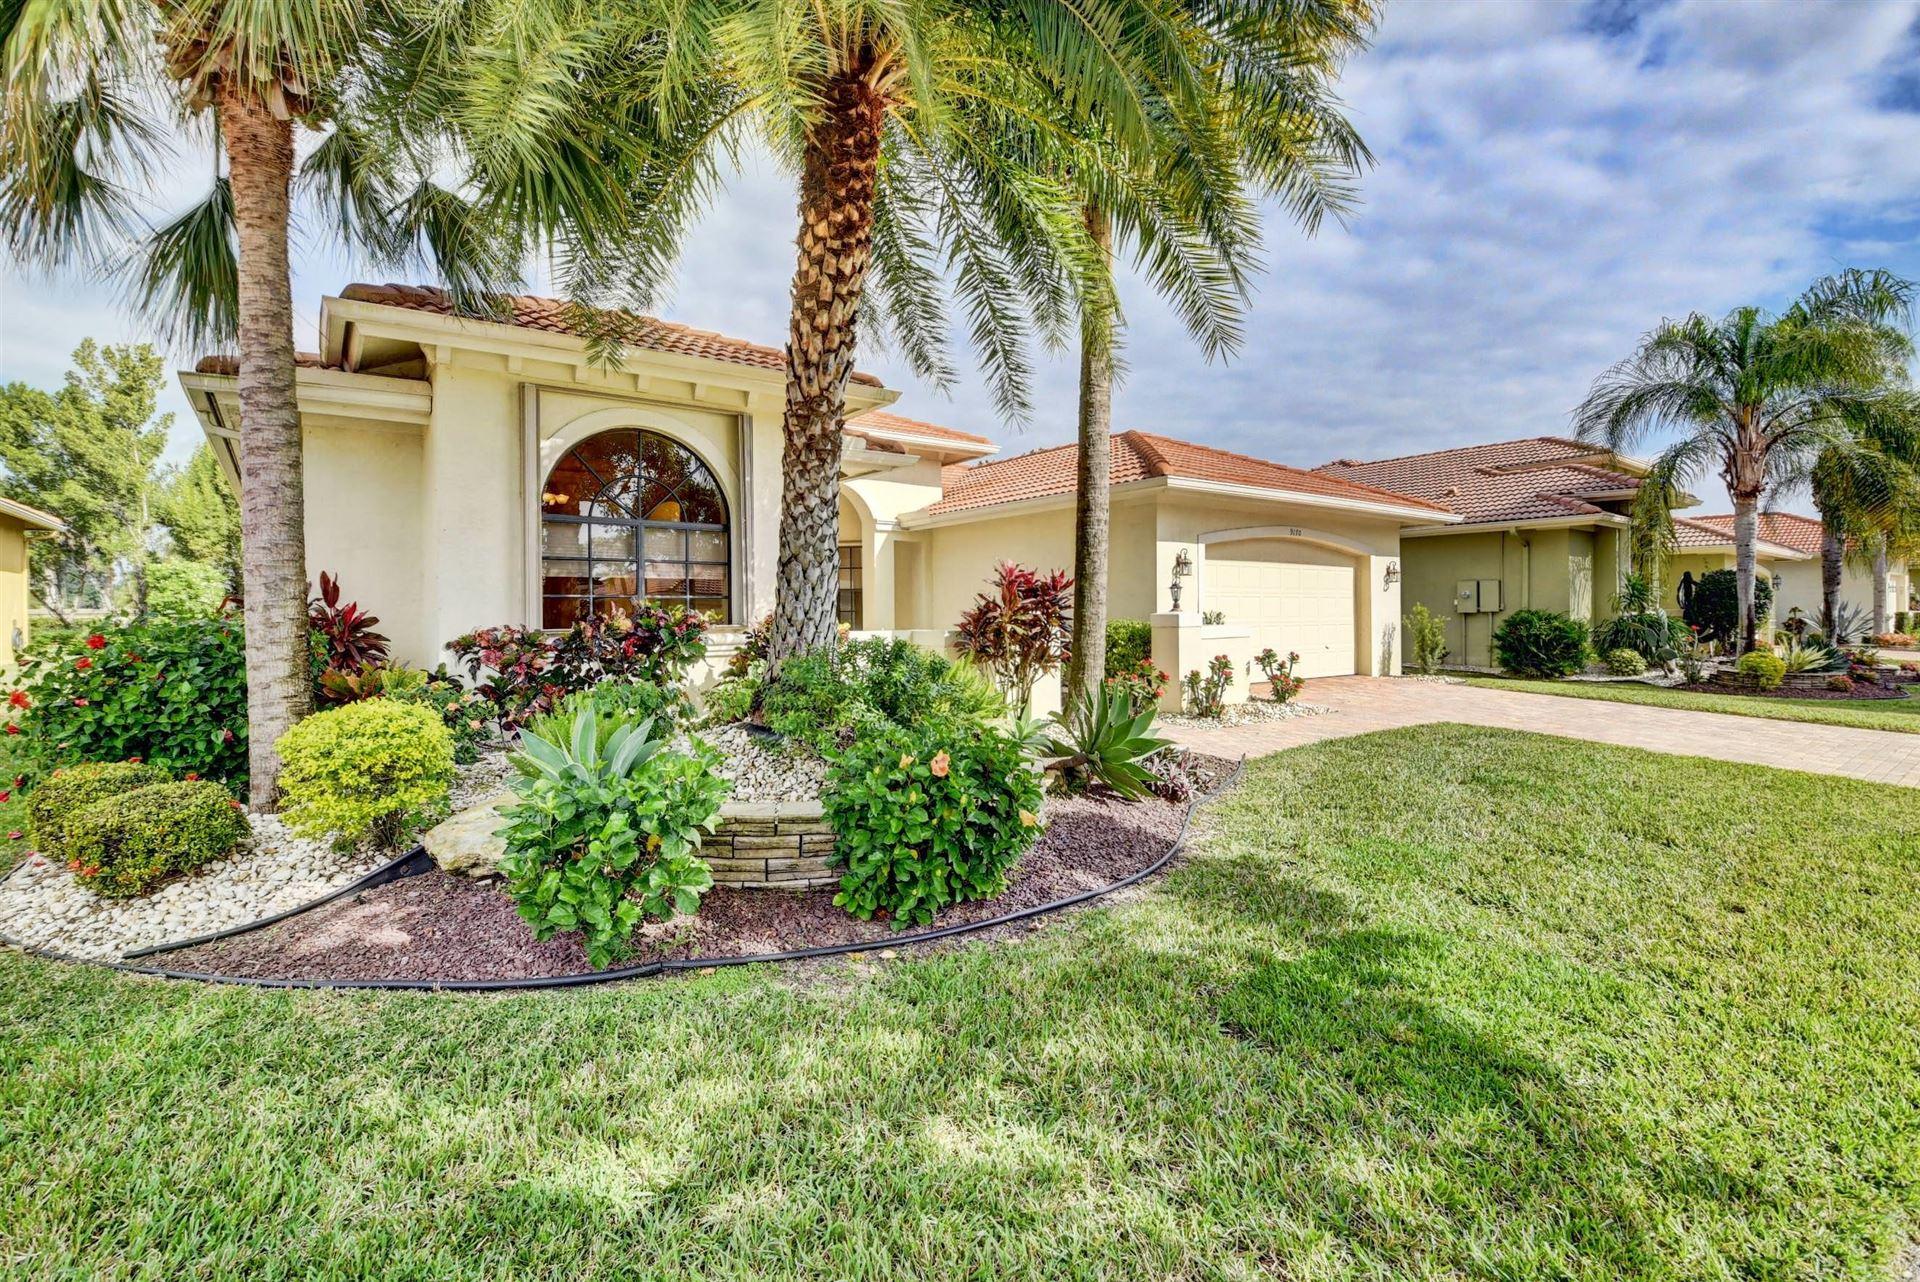 Photo of 9170 Isles Cay Drive, Delray Beach, FL 33446 (MLS # RX-10683123)